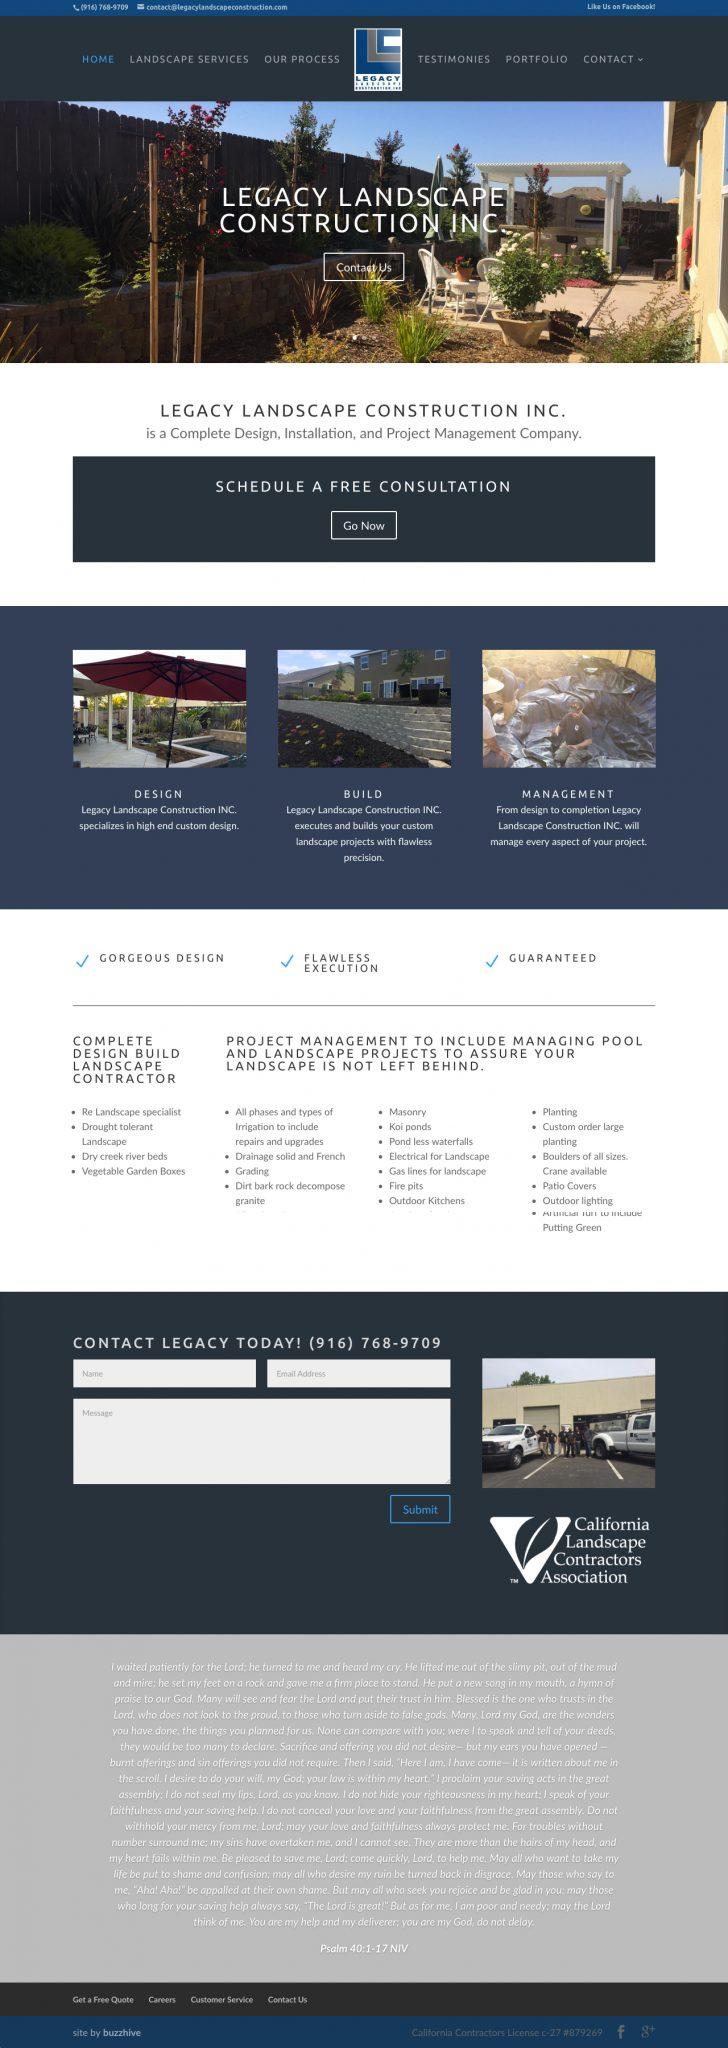 LegacyLandscapeConstruction.com_ Web Design & Development